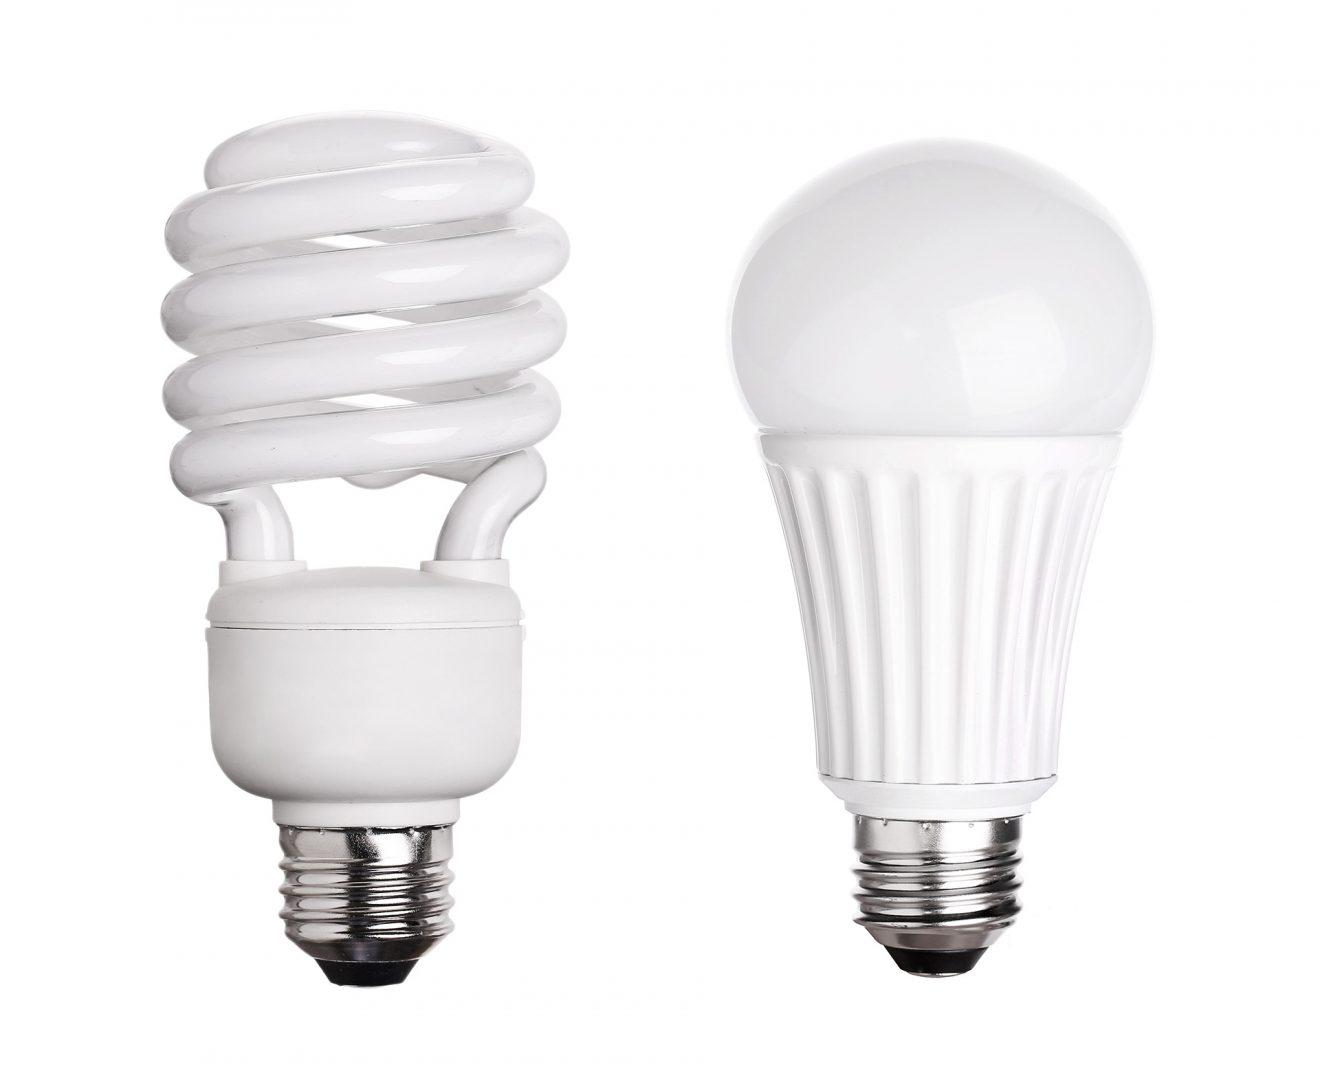 conjunto de lâmpada fluorescente CFL LED isolado no fundo branco